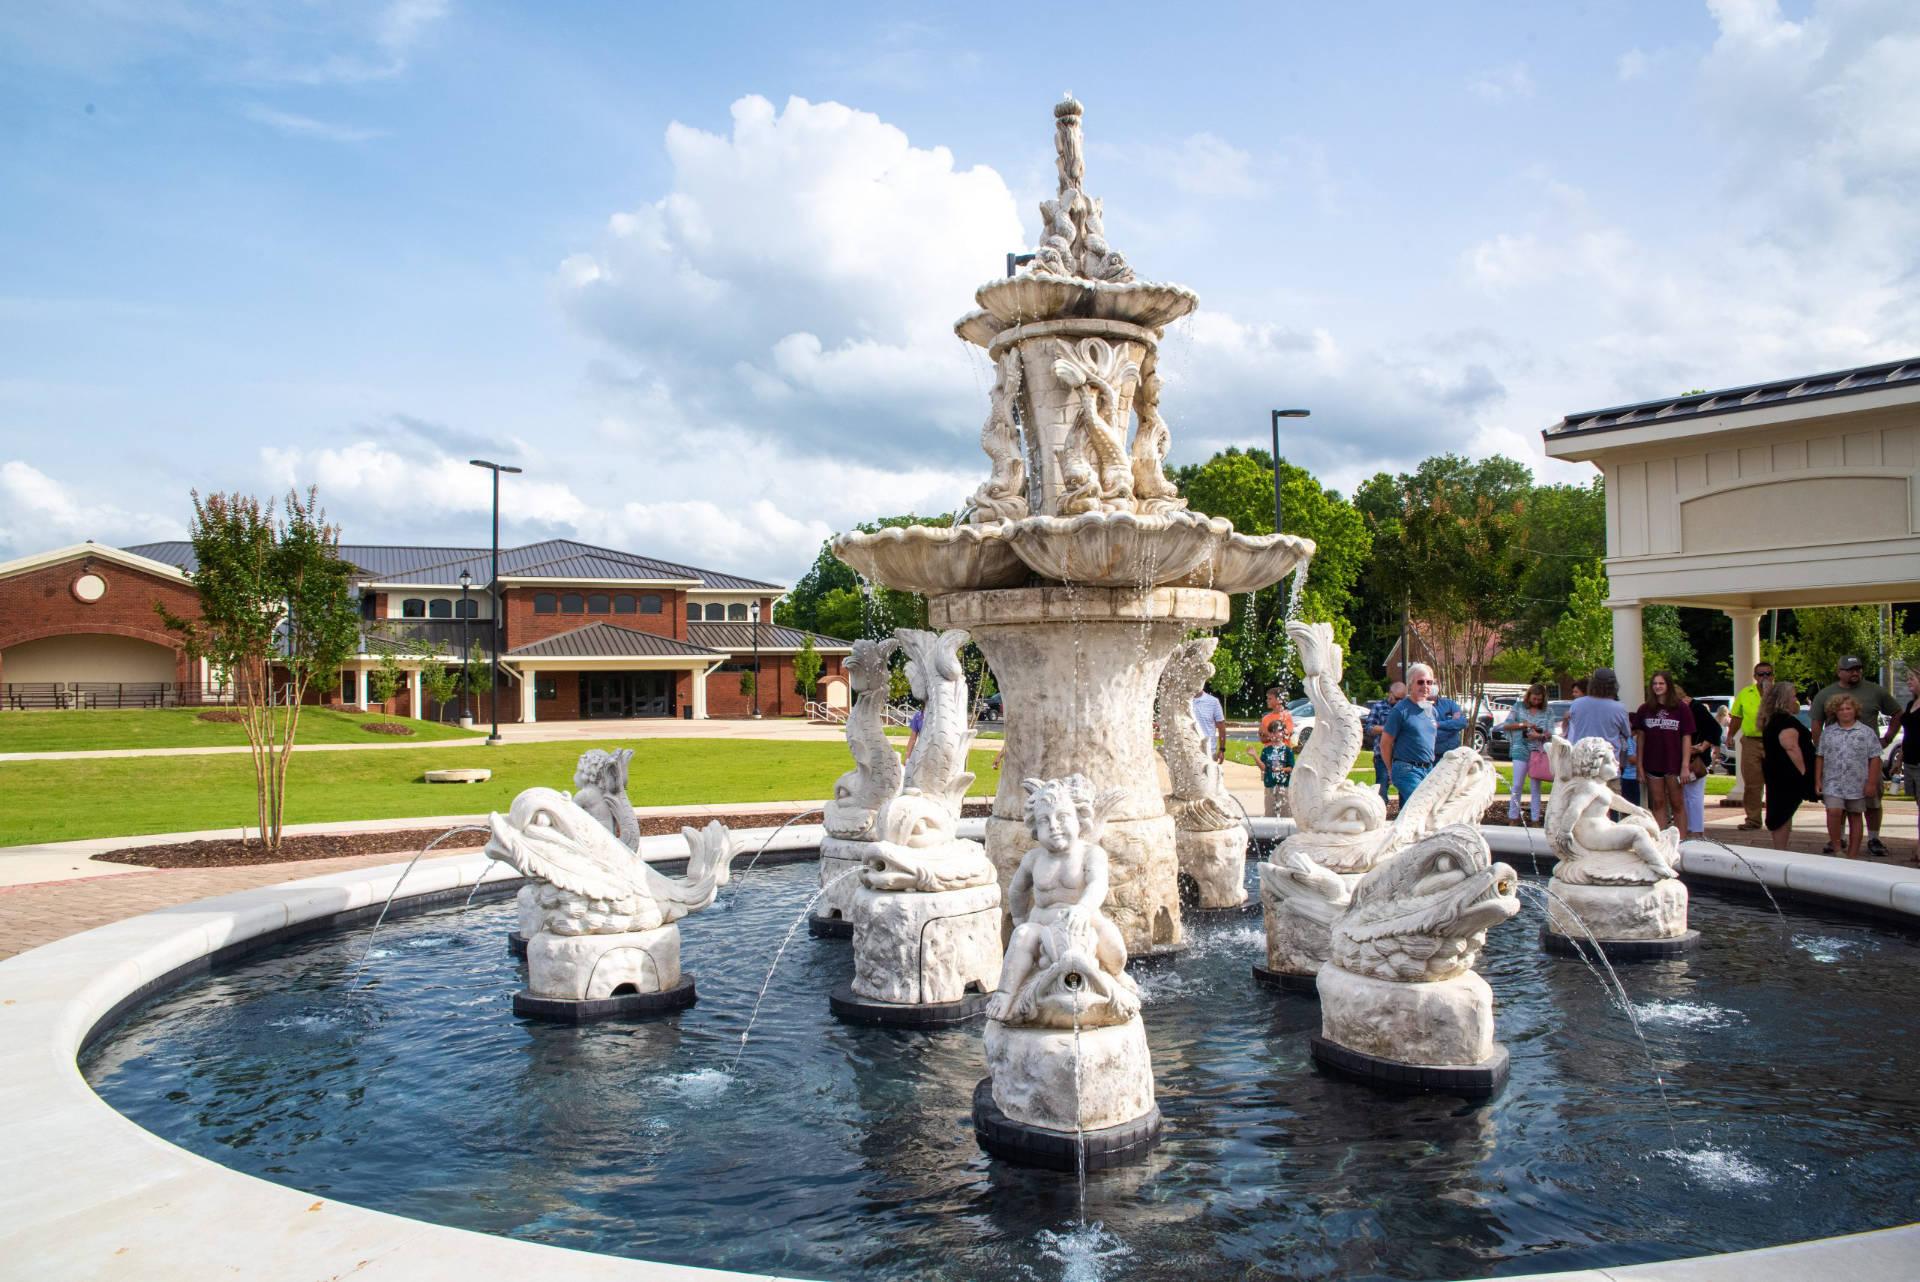 https://alabama-travel.s3.amazonaws.com/partners-uploads/photo/image/6095f1029068320008af1b59/Old-Mill-Square-Columbiana-Shelby-County-Alabama-Colonnade-Fountain-Plaza-Premiere.jpg